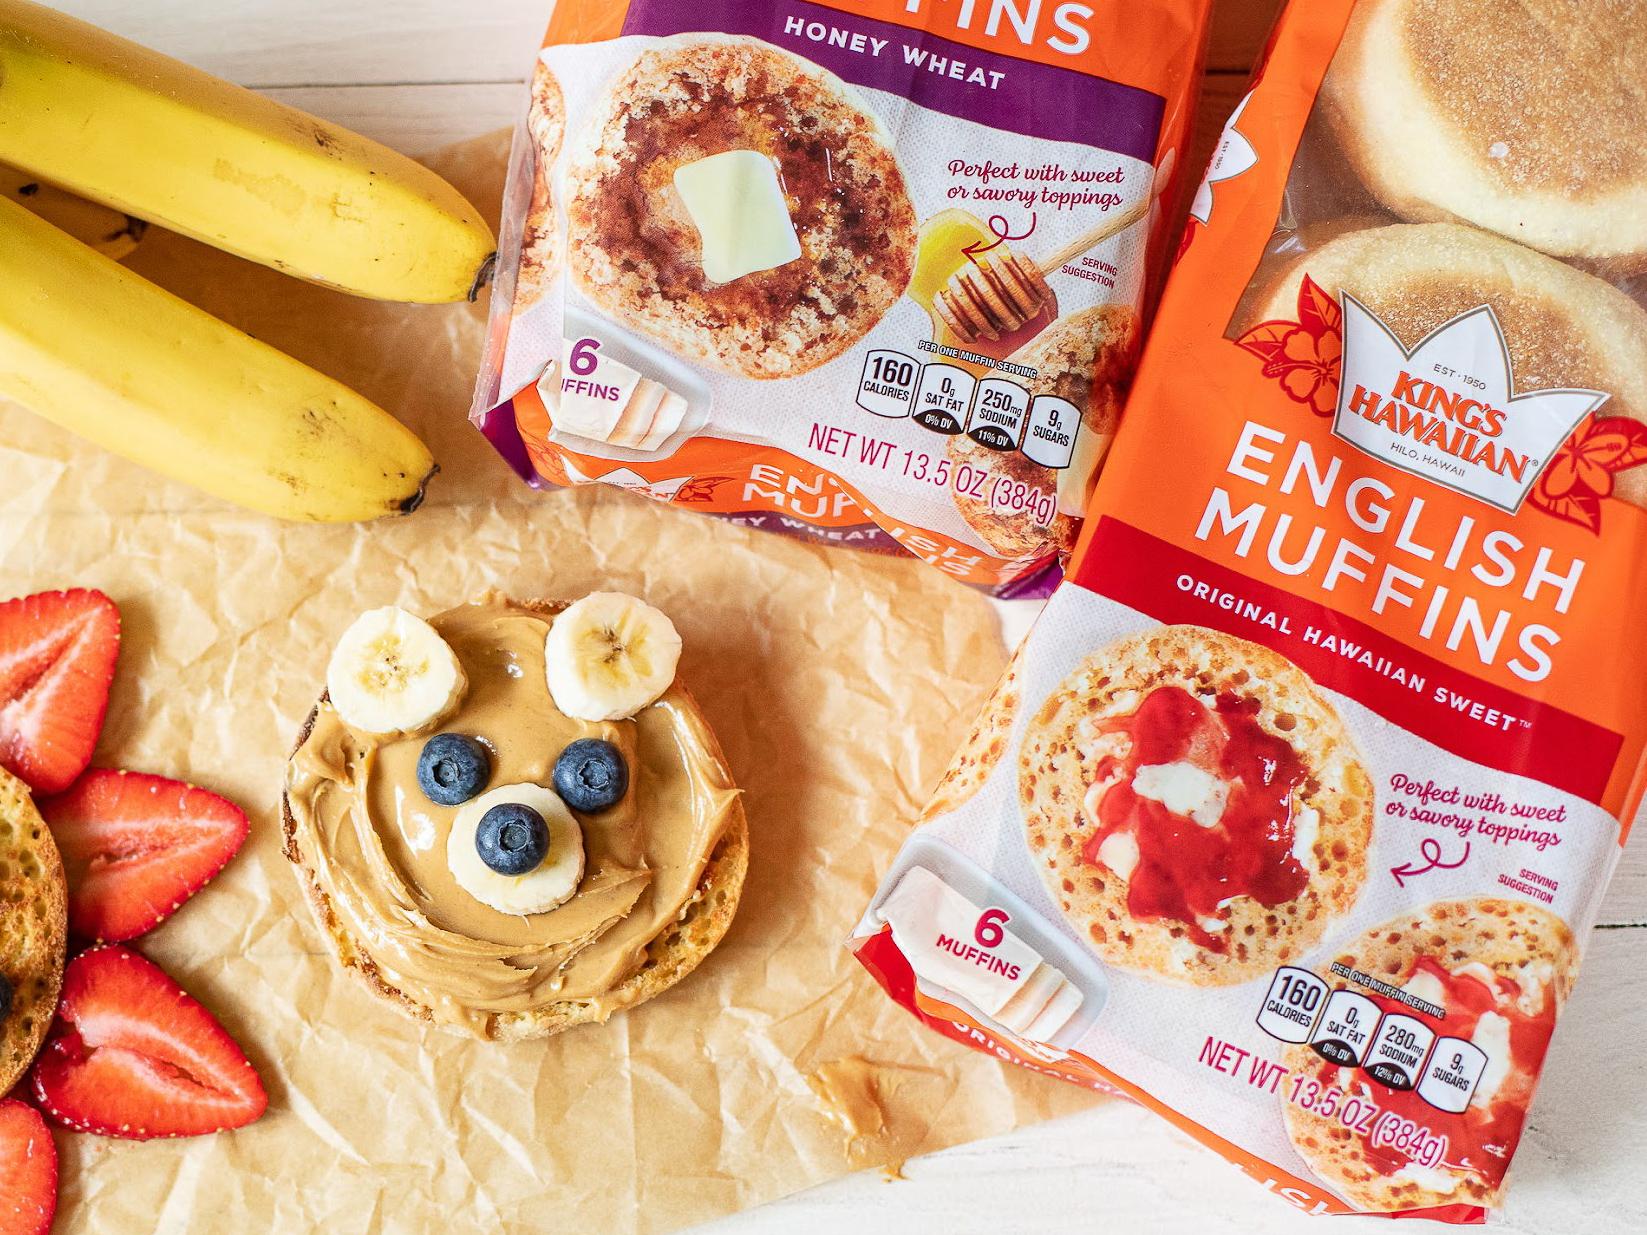 Back To School Is Tasty With King's Hawaiian English Muffins 1